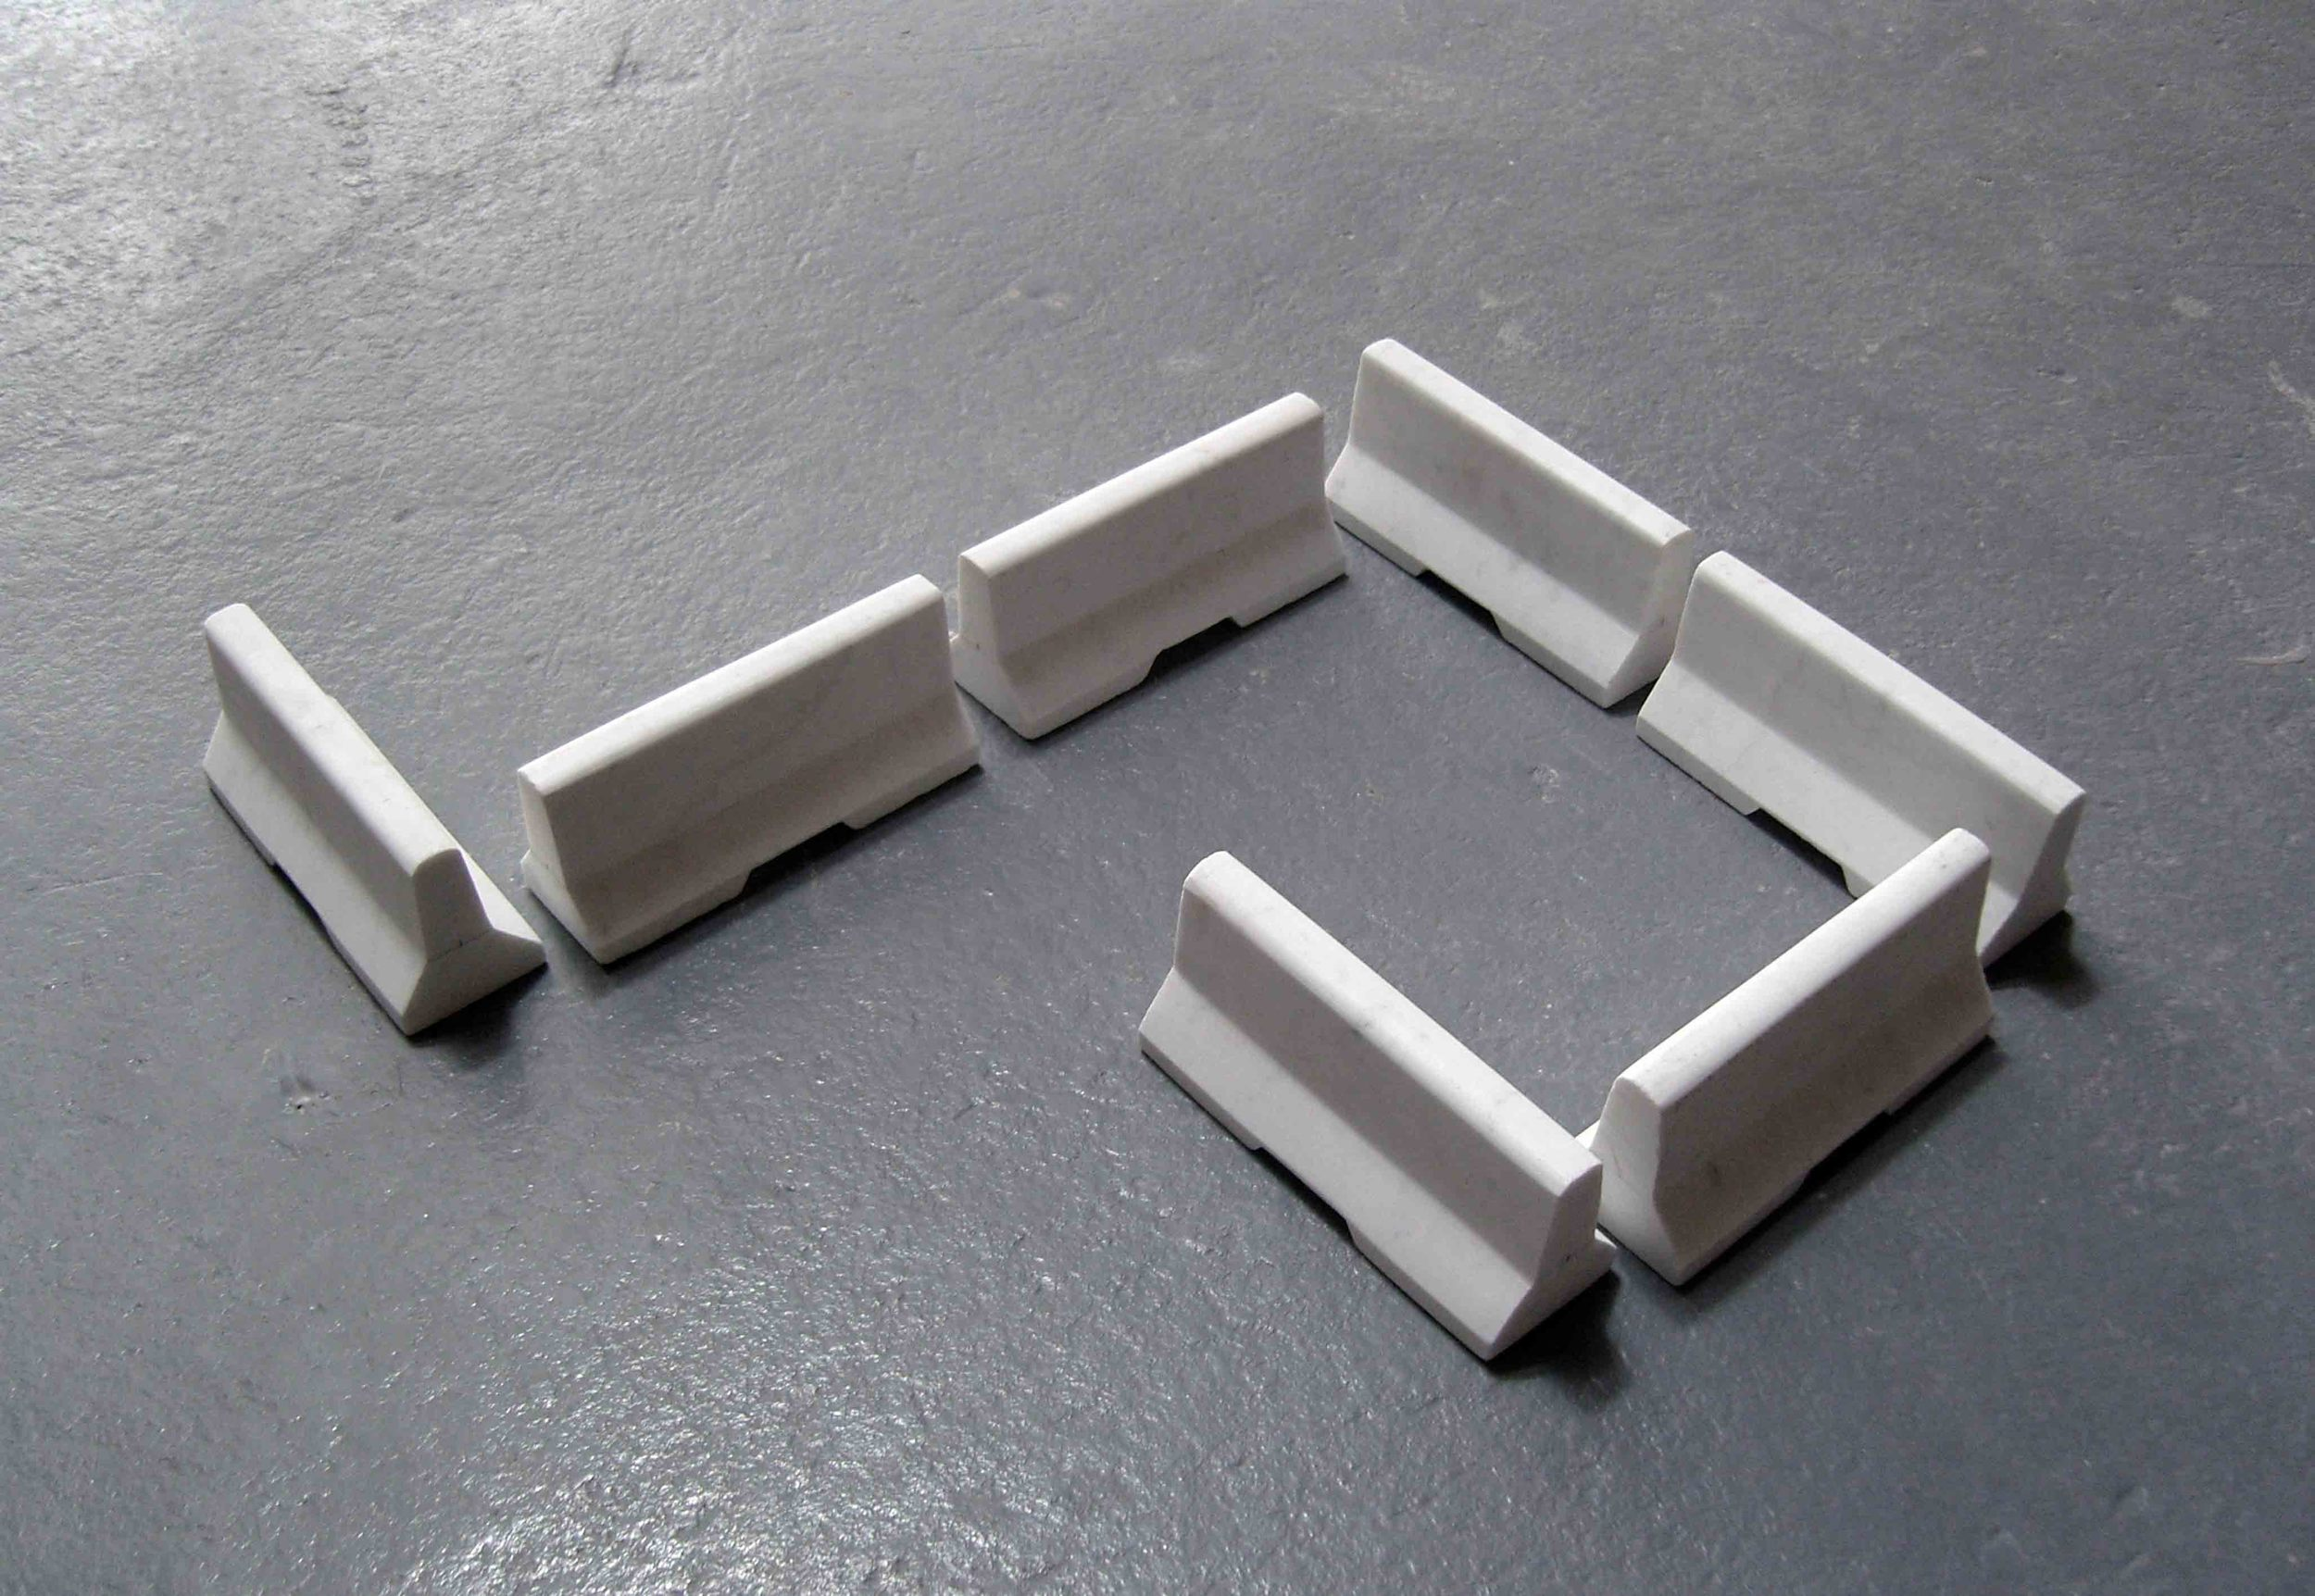 Invitation,  2007, white marble (7 pieces), 7.5x6x17cm each.